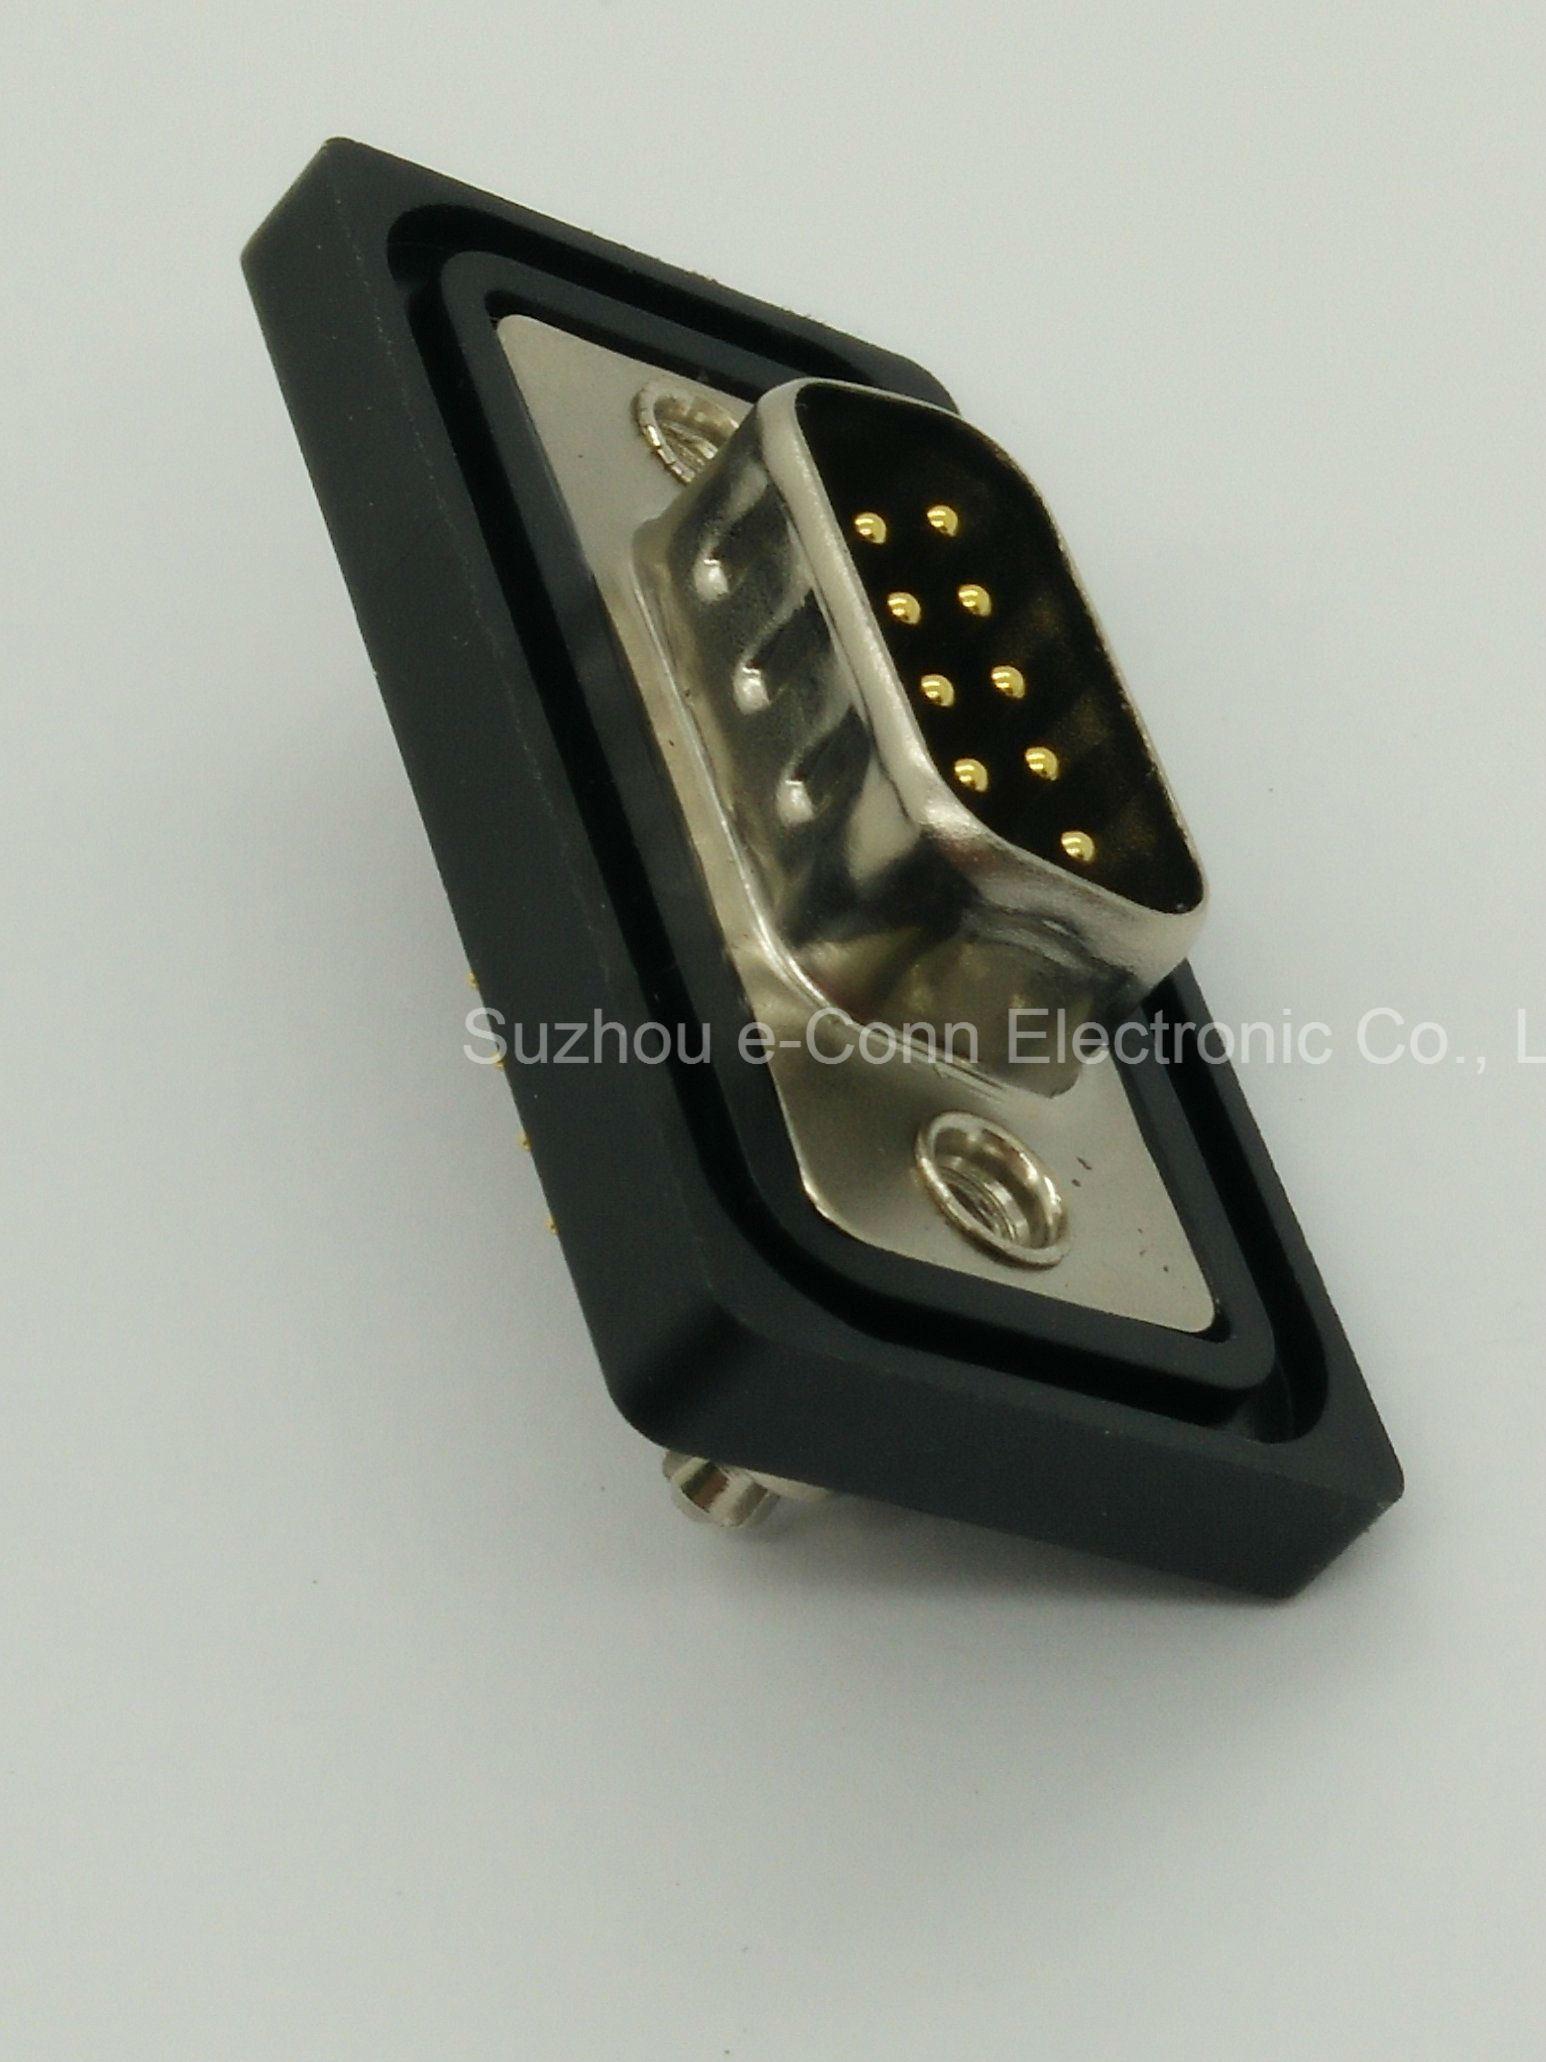 IP67 IP68 Waterproof D-SUB Connector